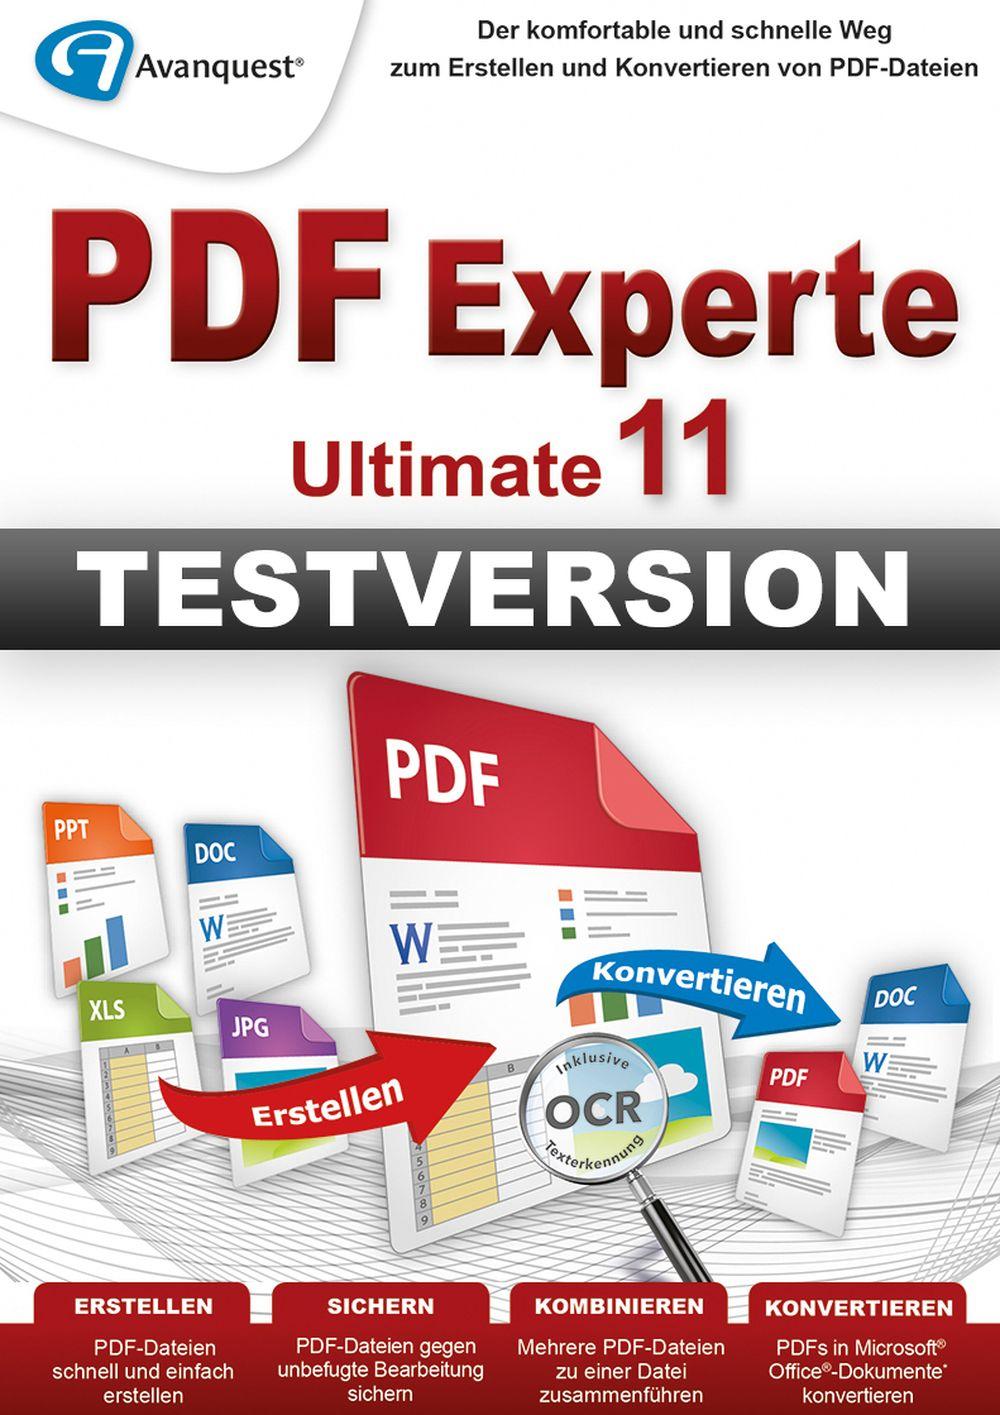 PDF Experte 11 Ultimate - kostenlos testen! Windows 10 8 7 Vista XP [Download]